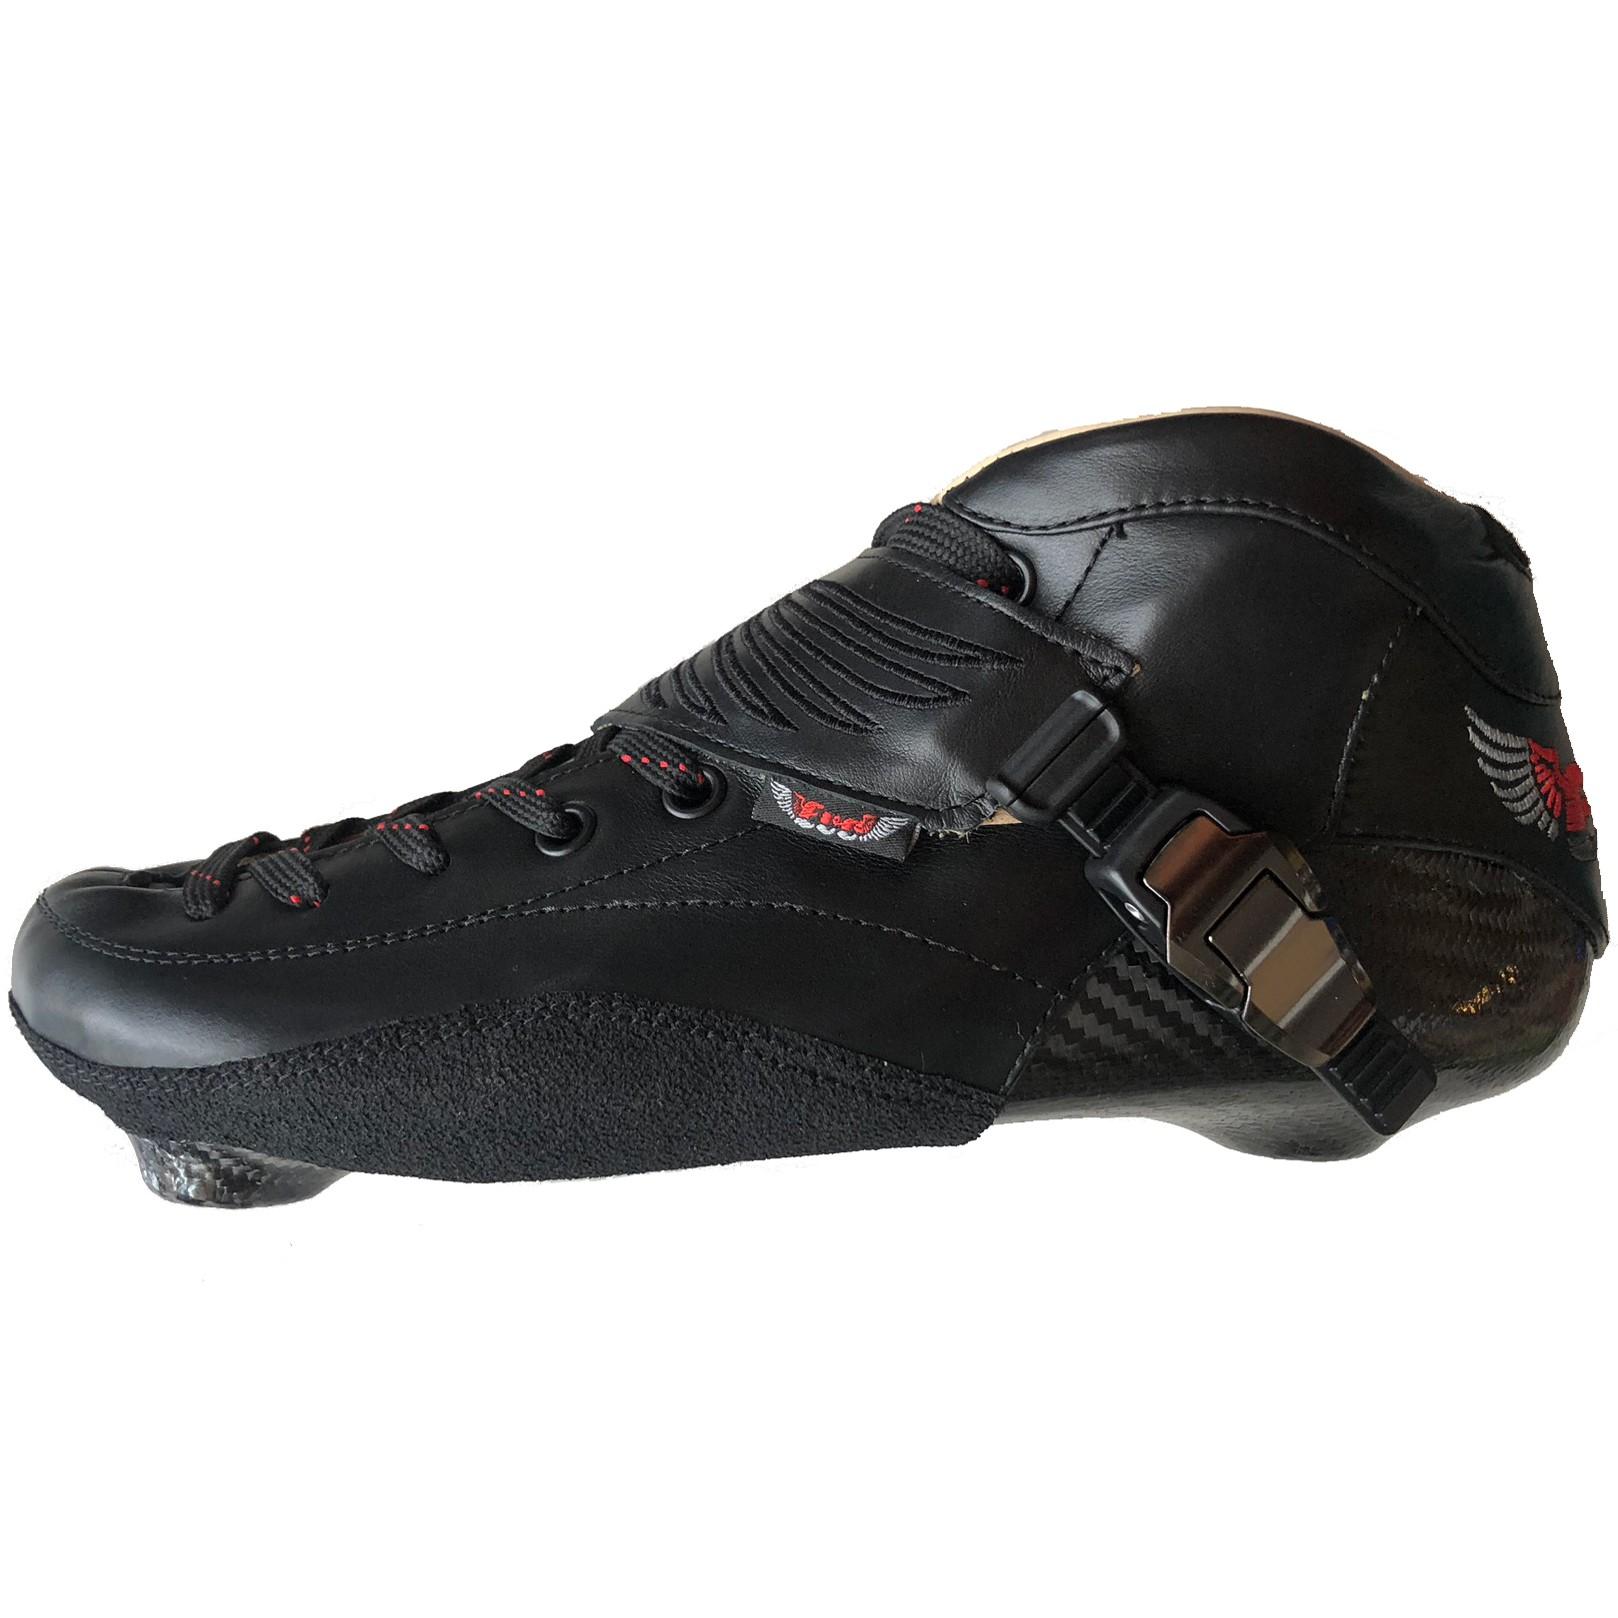 3df230a8b40 EVO Velocity inline boot